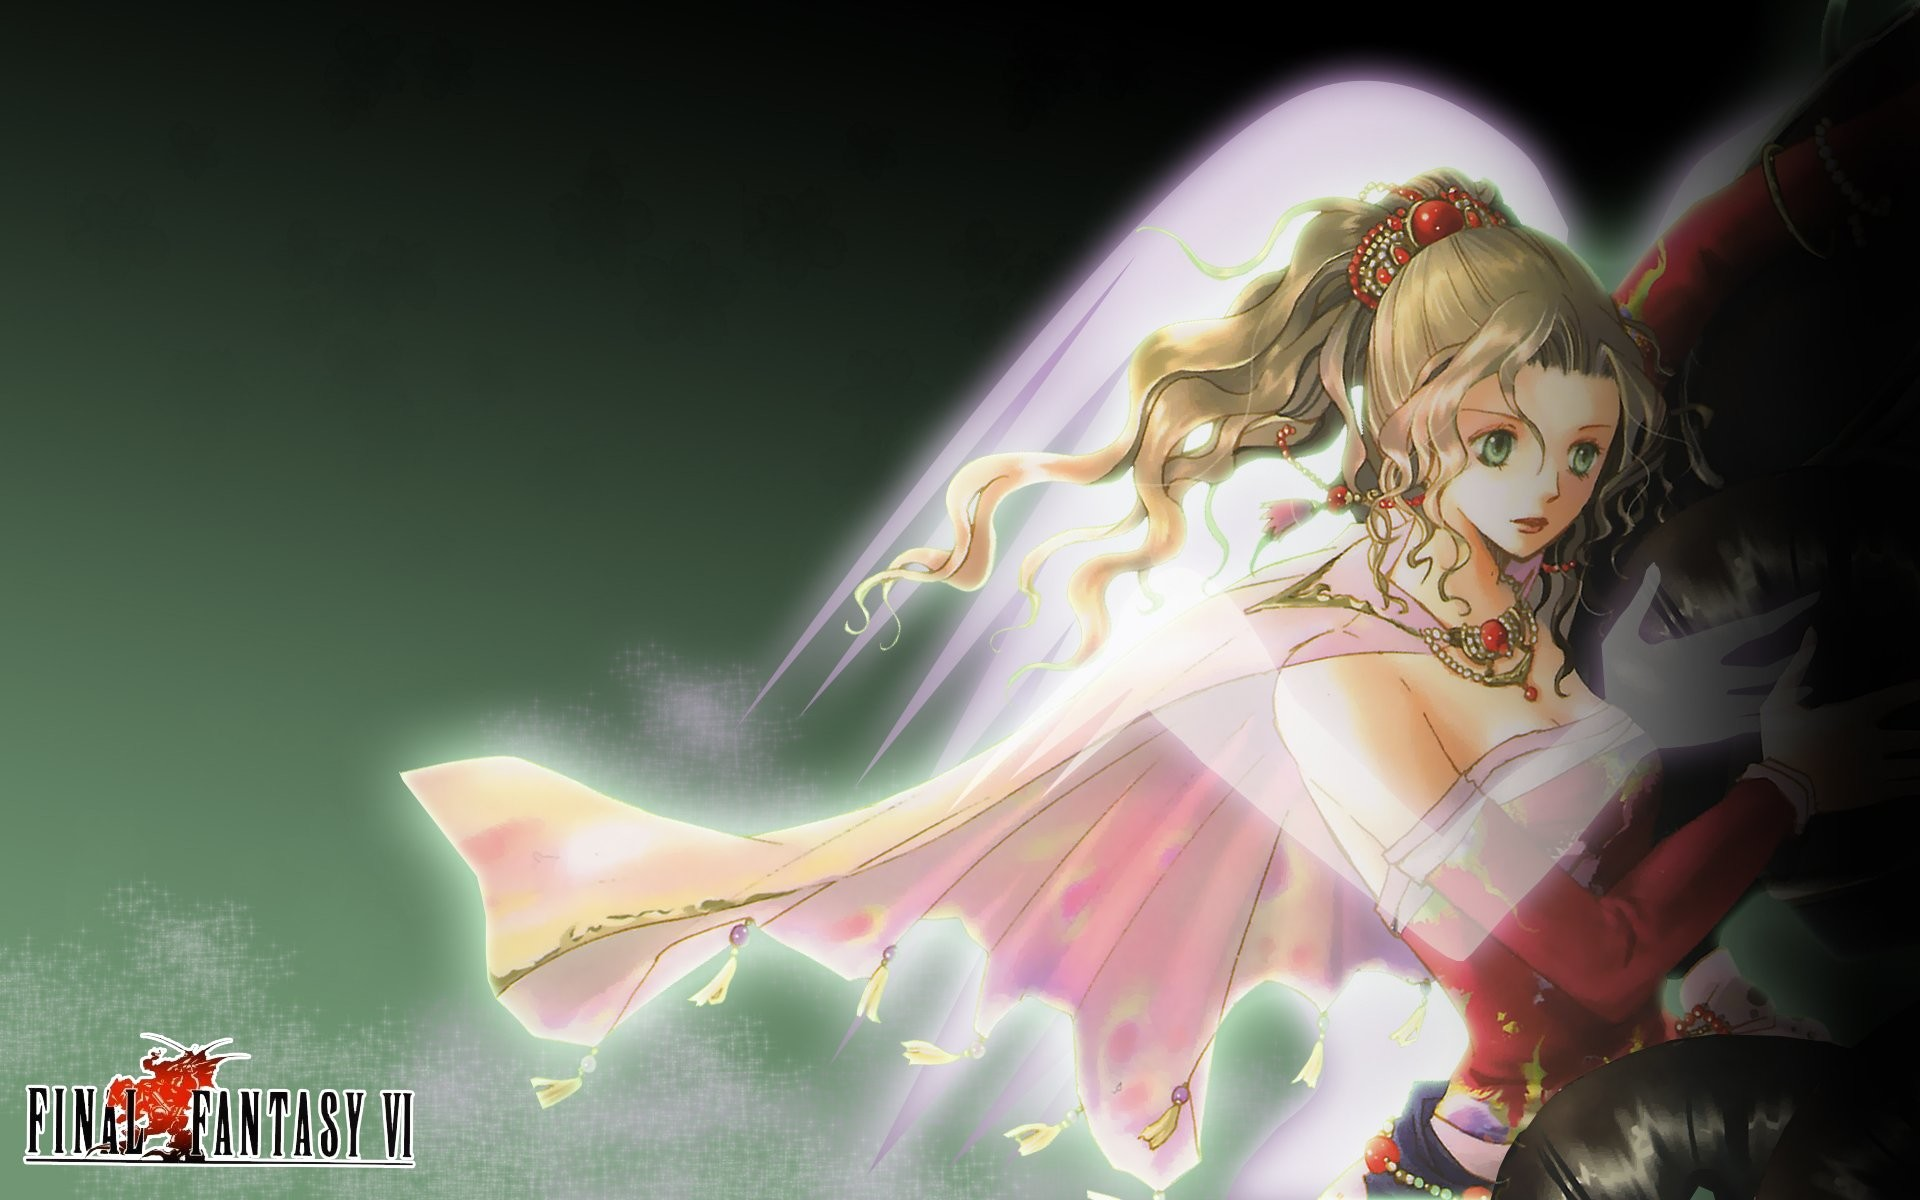 Square Enix Terra Final Fantasy VI wallpaper | | 262150 |  WallpaperUP